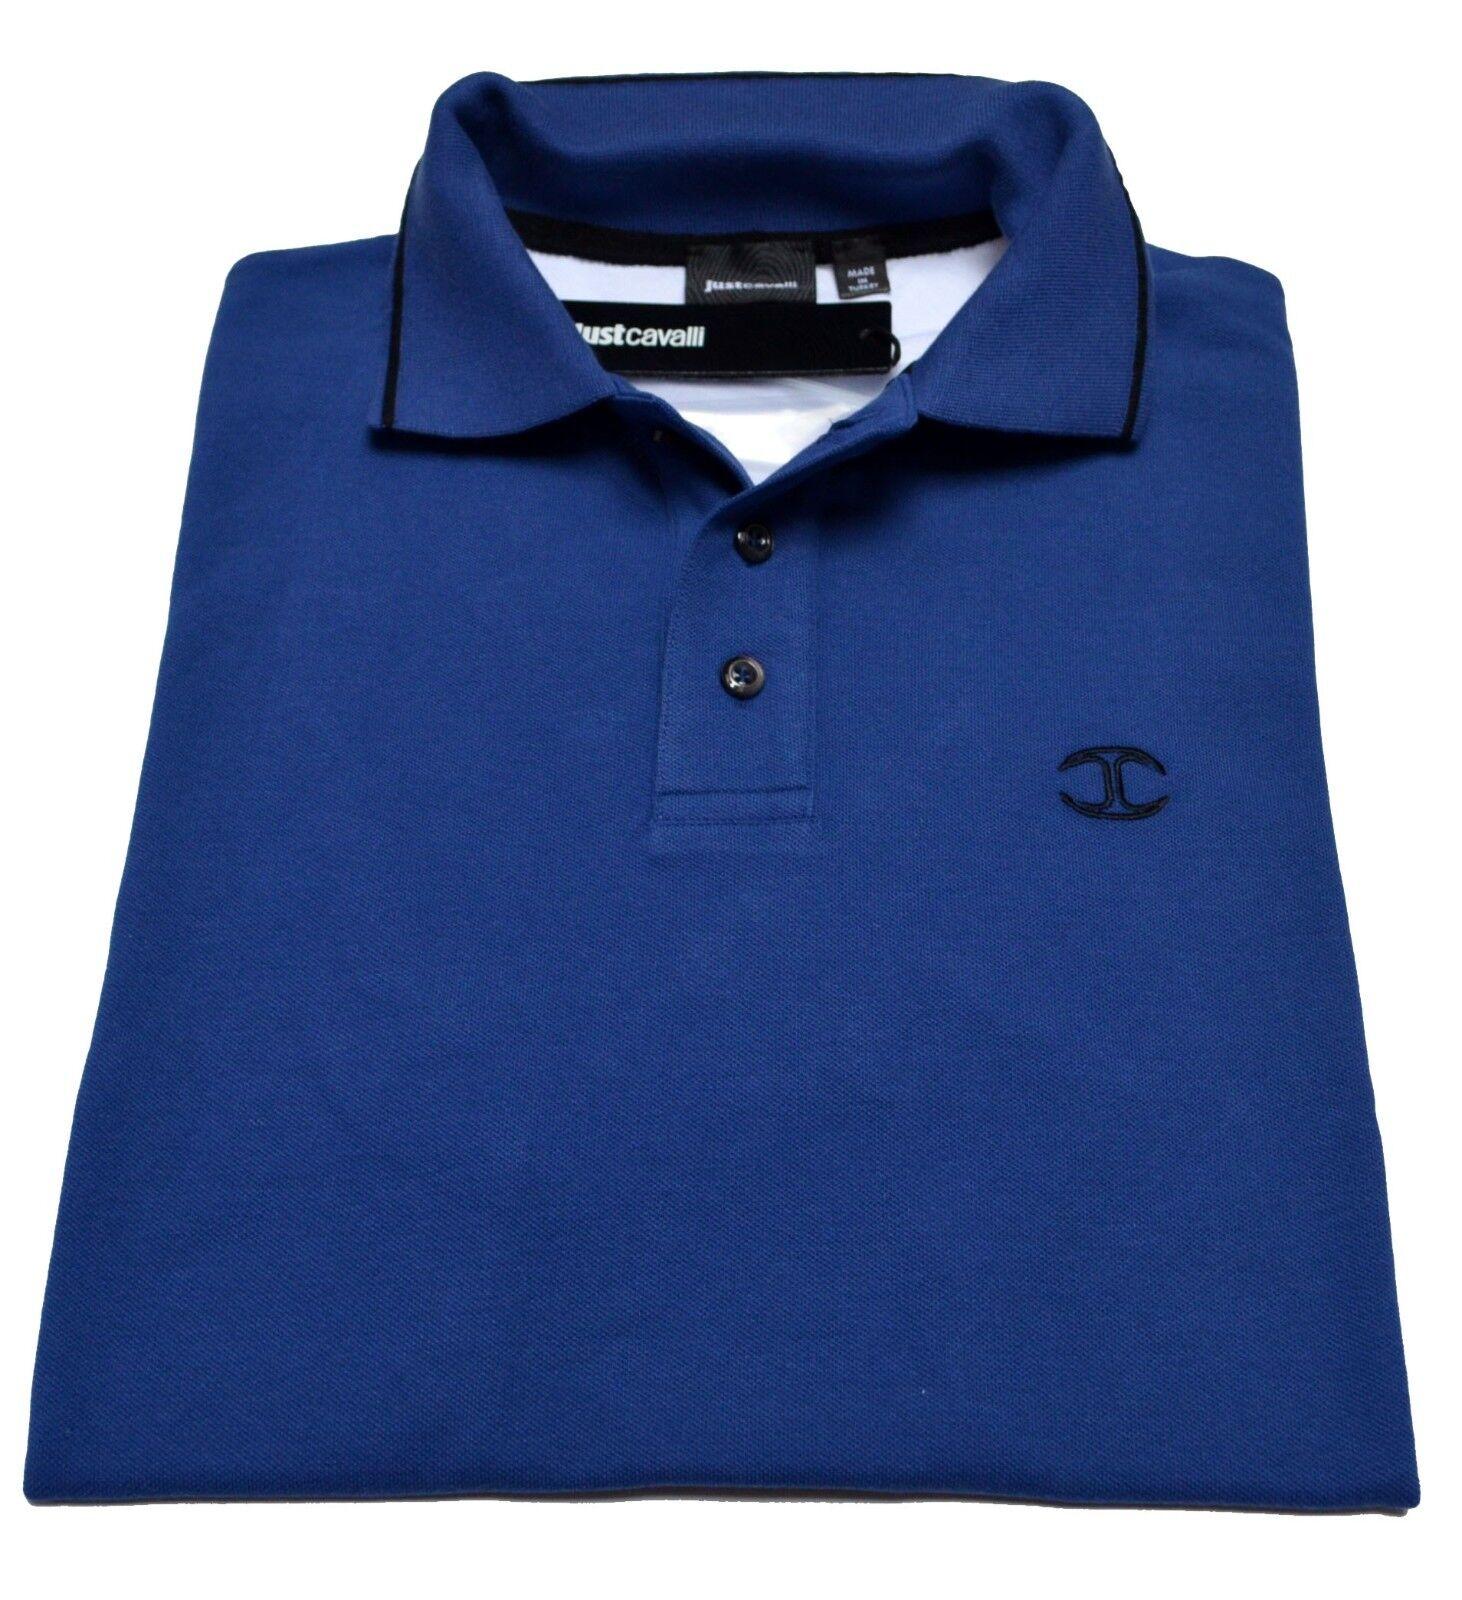 Polo Roberto Cavalli Class Logo Men Fashion T-shirt Tee Blau  Herren 100% genuine